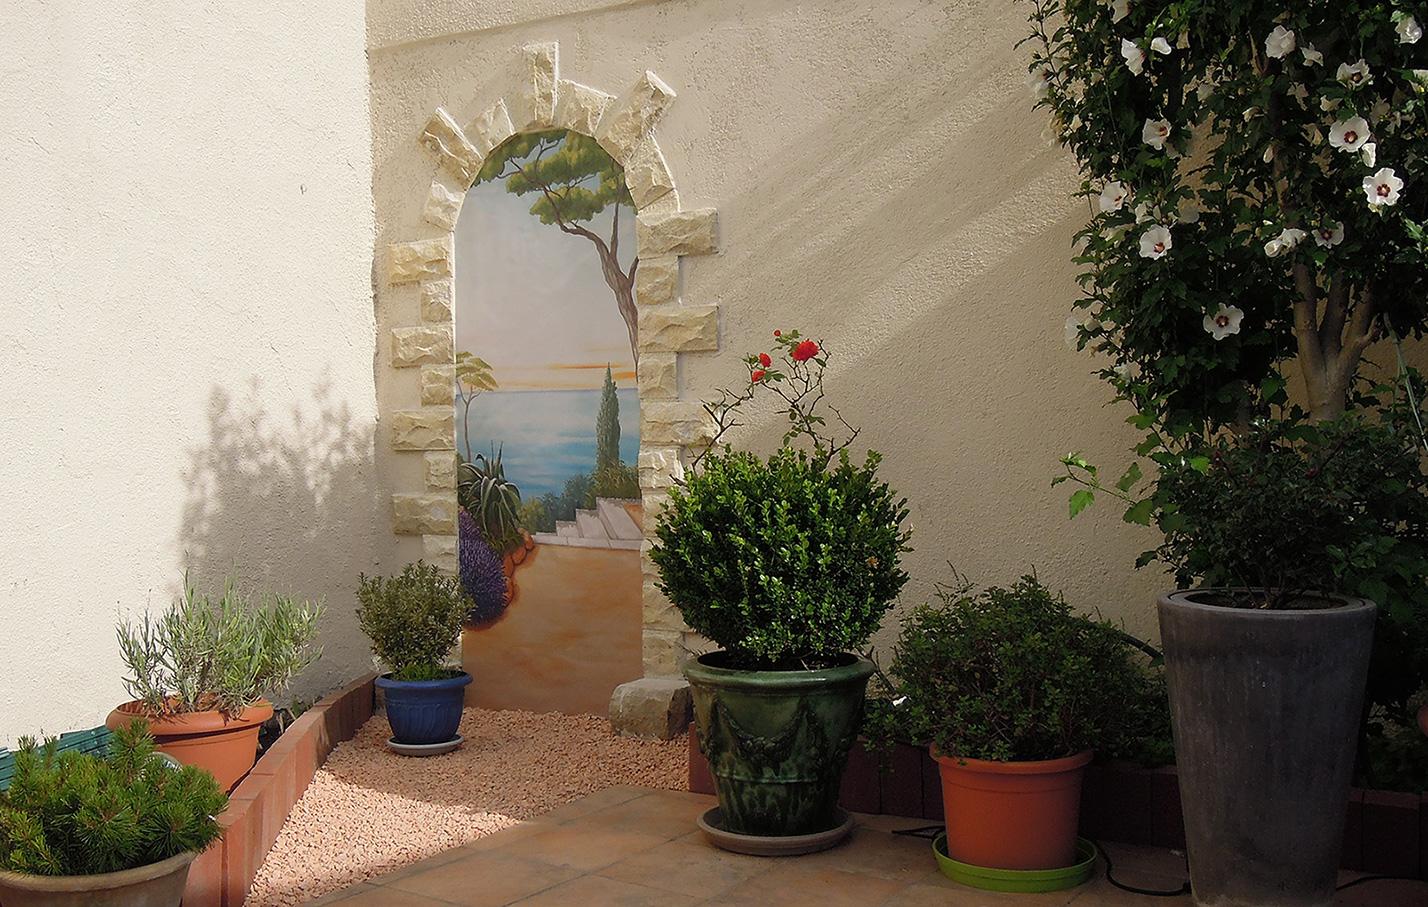 le blog belmon d co nos r alisations en ext rieur jardins terrasses et v randa. Black Bedroom Furniture Sets. Home Design Ideas